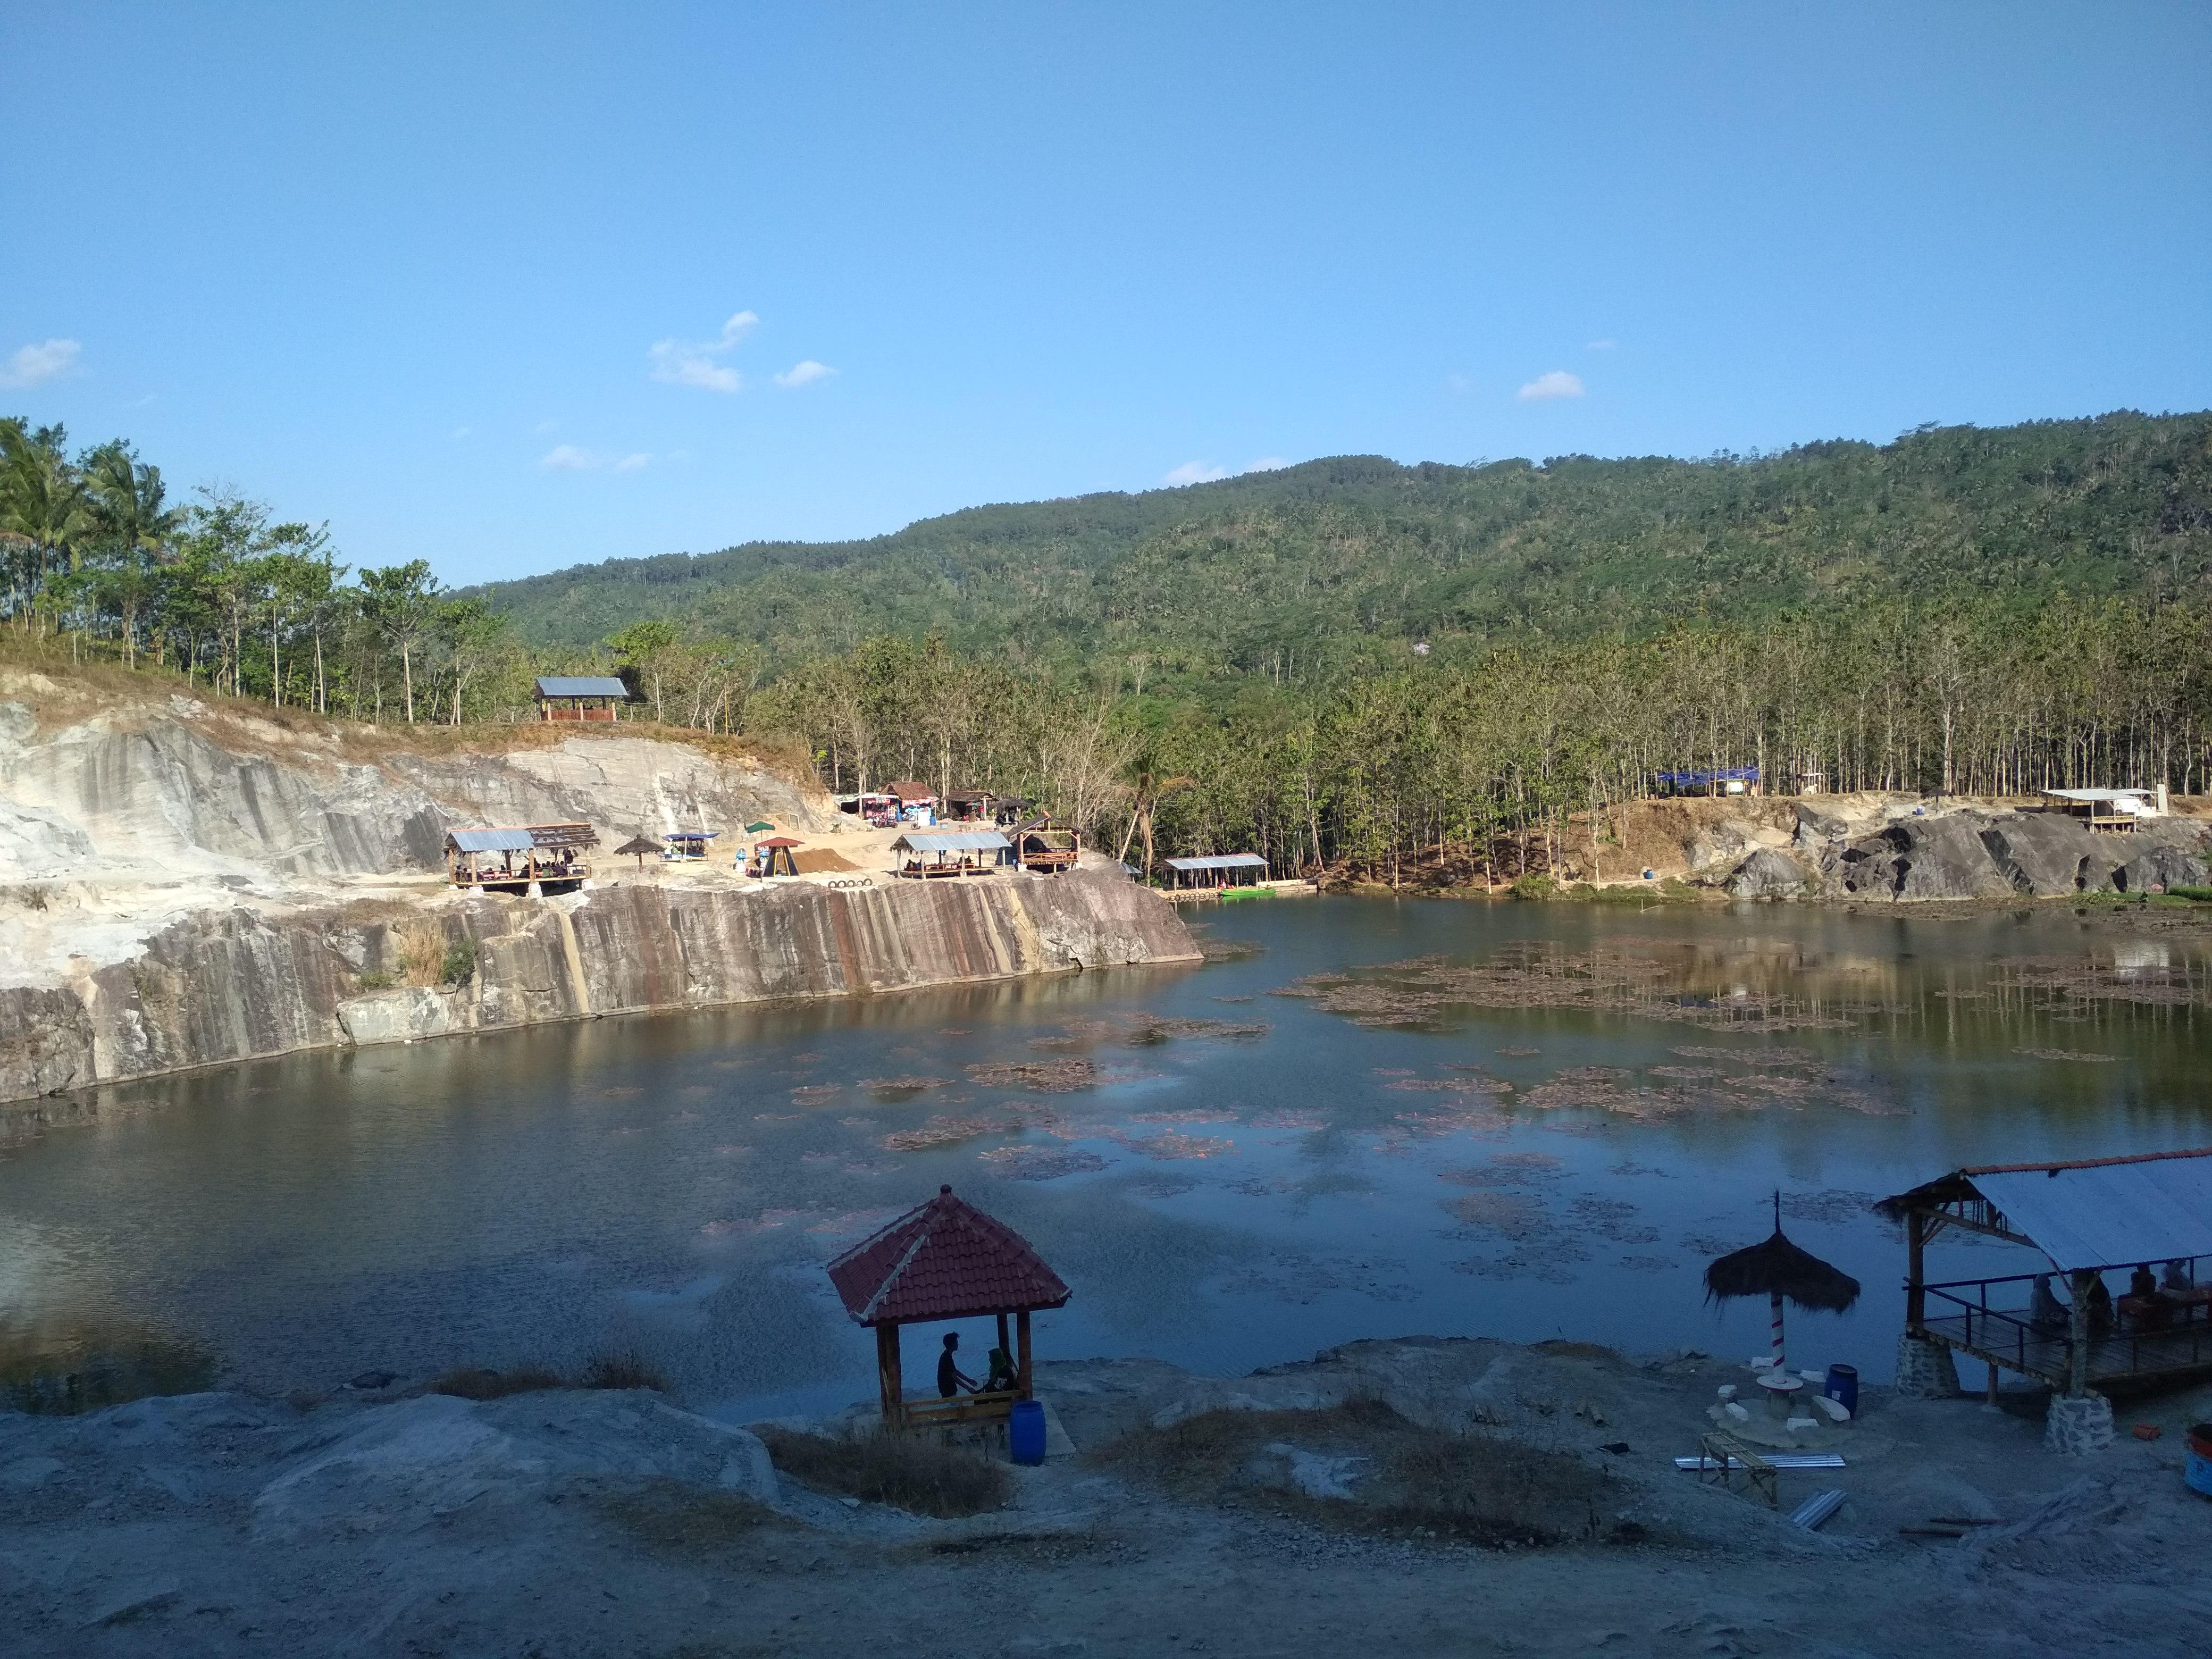 Wisata Gunung Tampomas